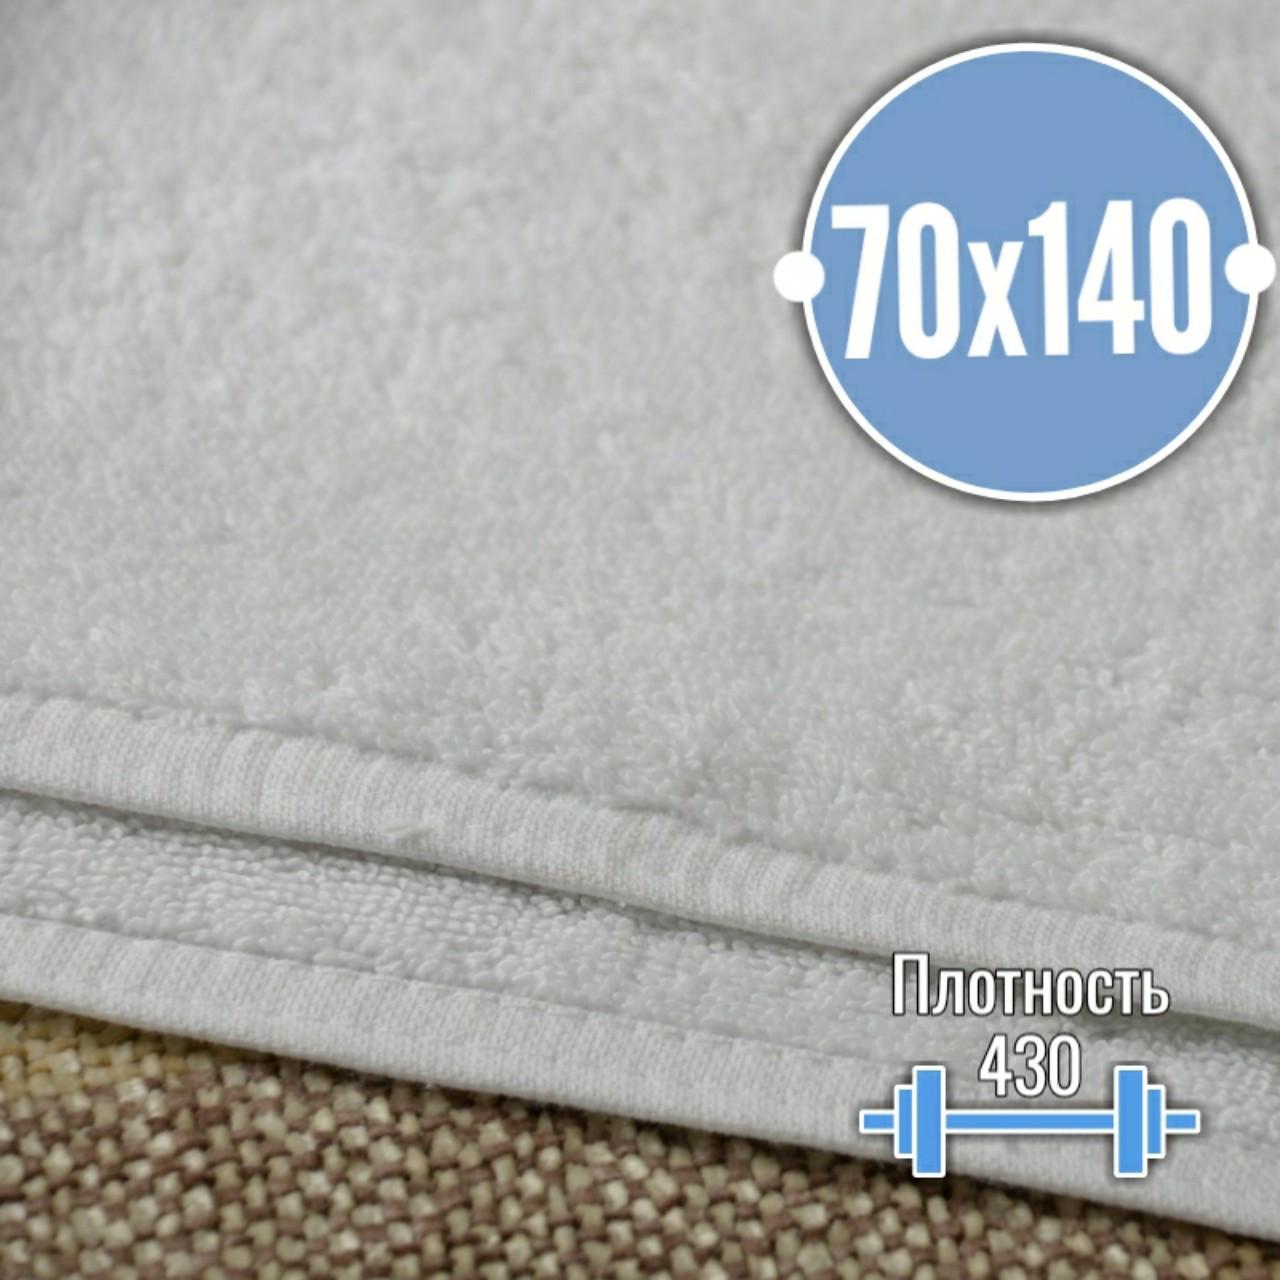 Махровые полотенца Турция, пл.:430 гр./м2, 70х140 см., Цвет: Белый